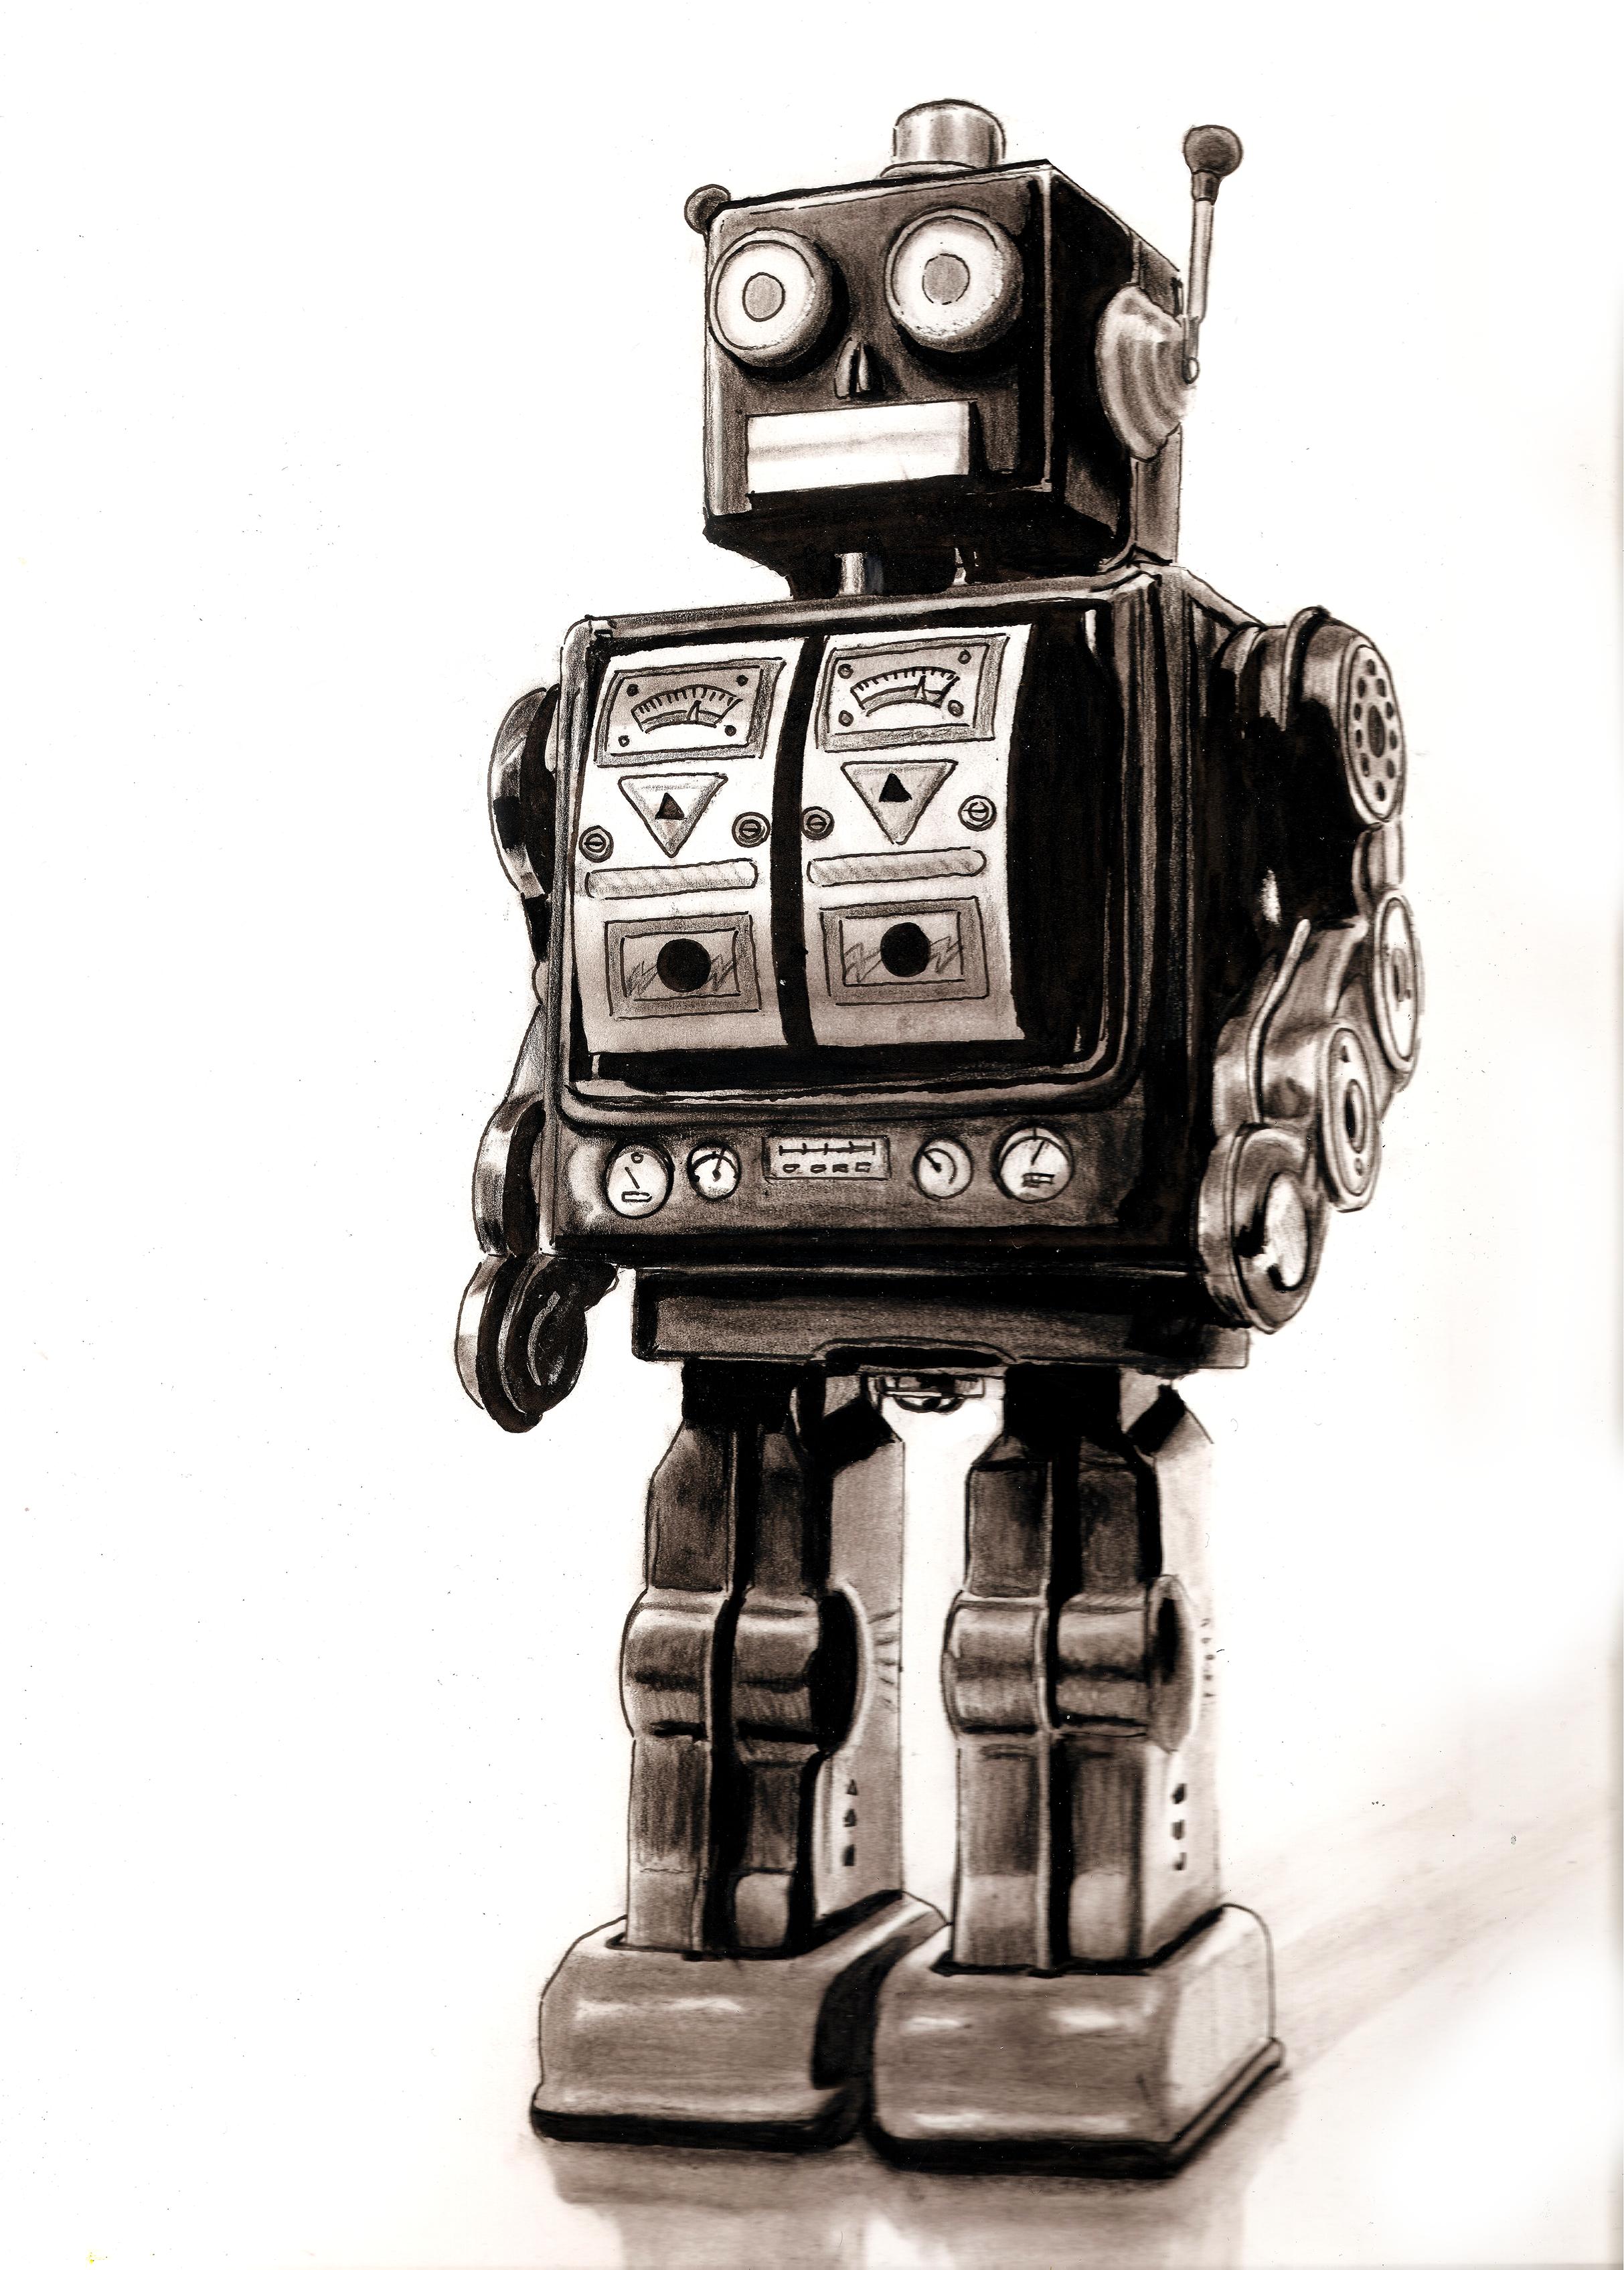 2426x3391 Retro Robot Sketch By Bobo1972